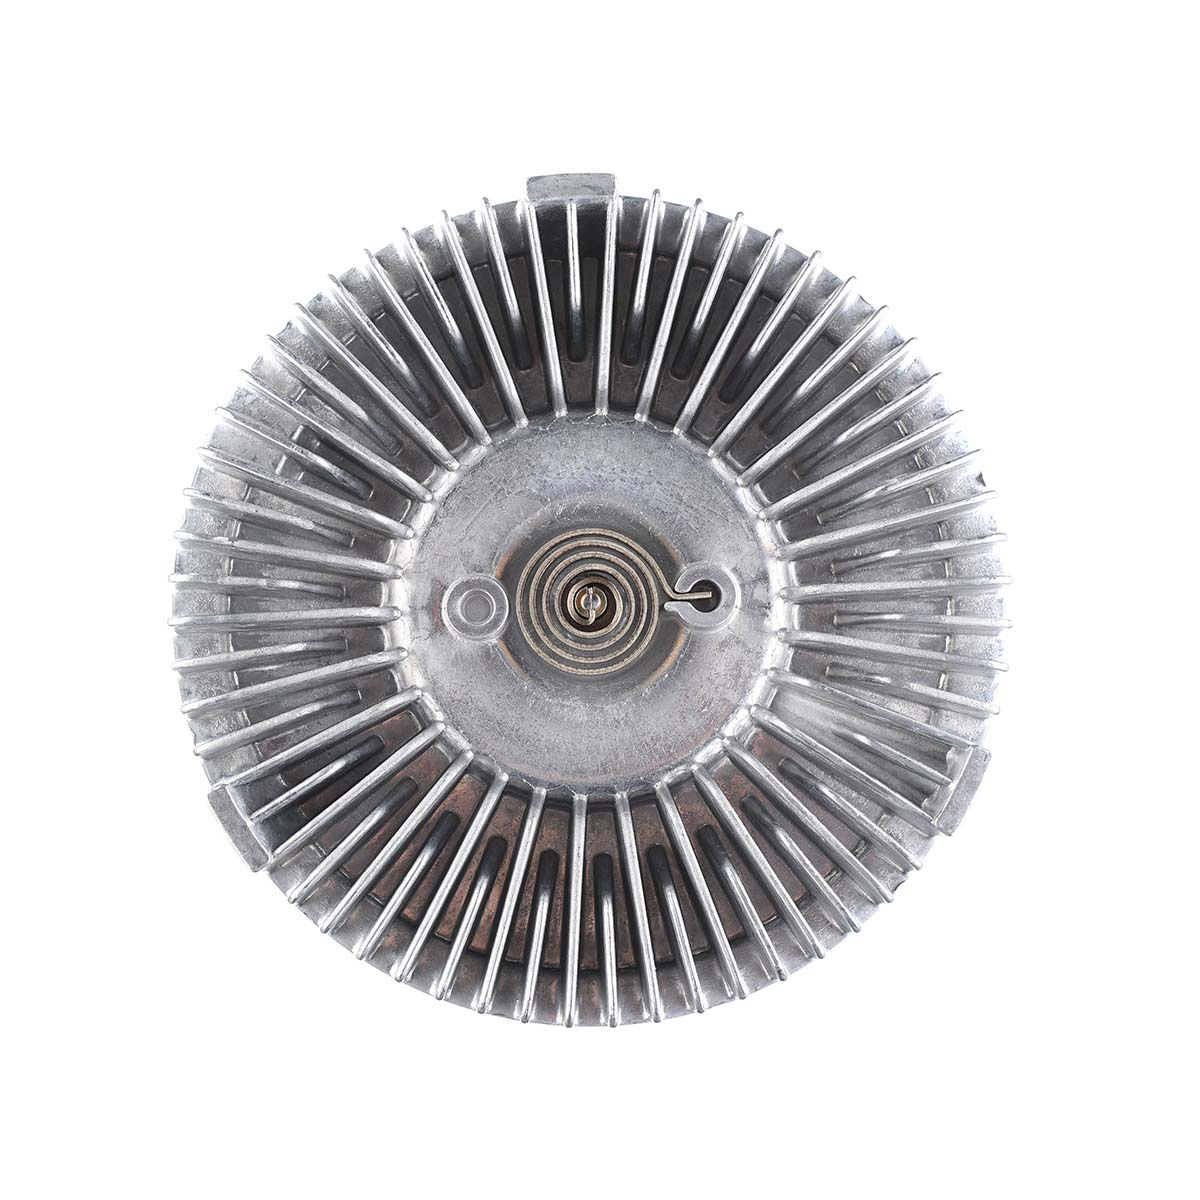 medium resolution of engine cooling fan clutch for ford ranger 1998 1999 2011 explorer sport trac mazda b4000